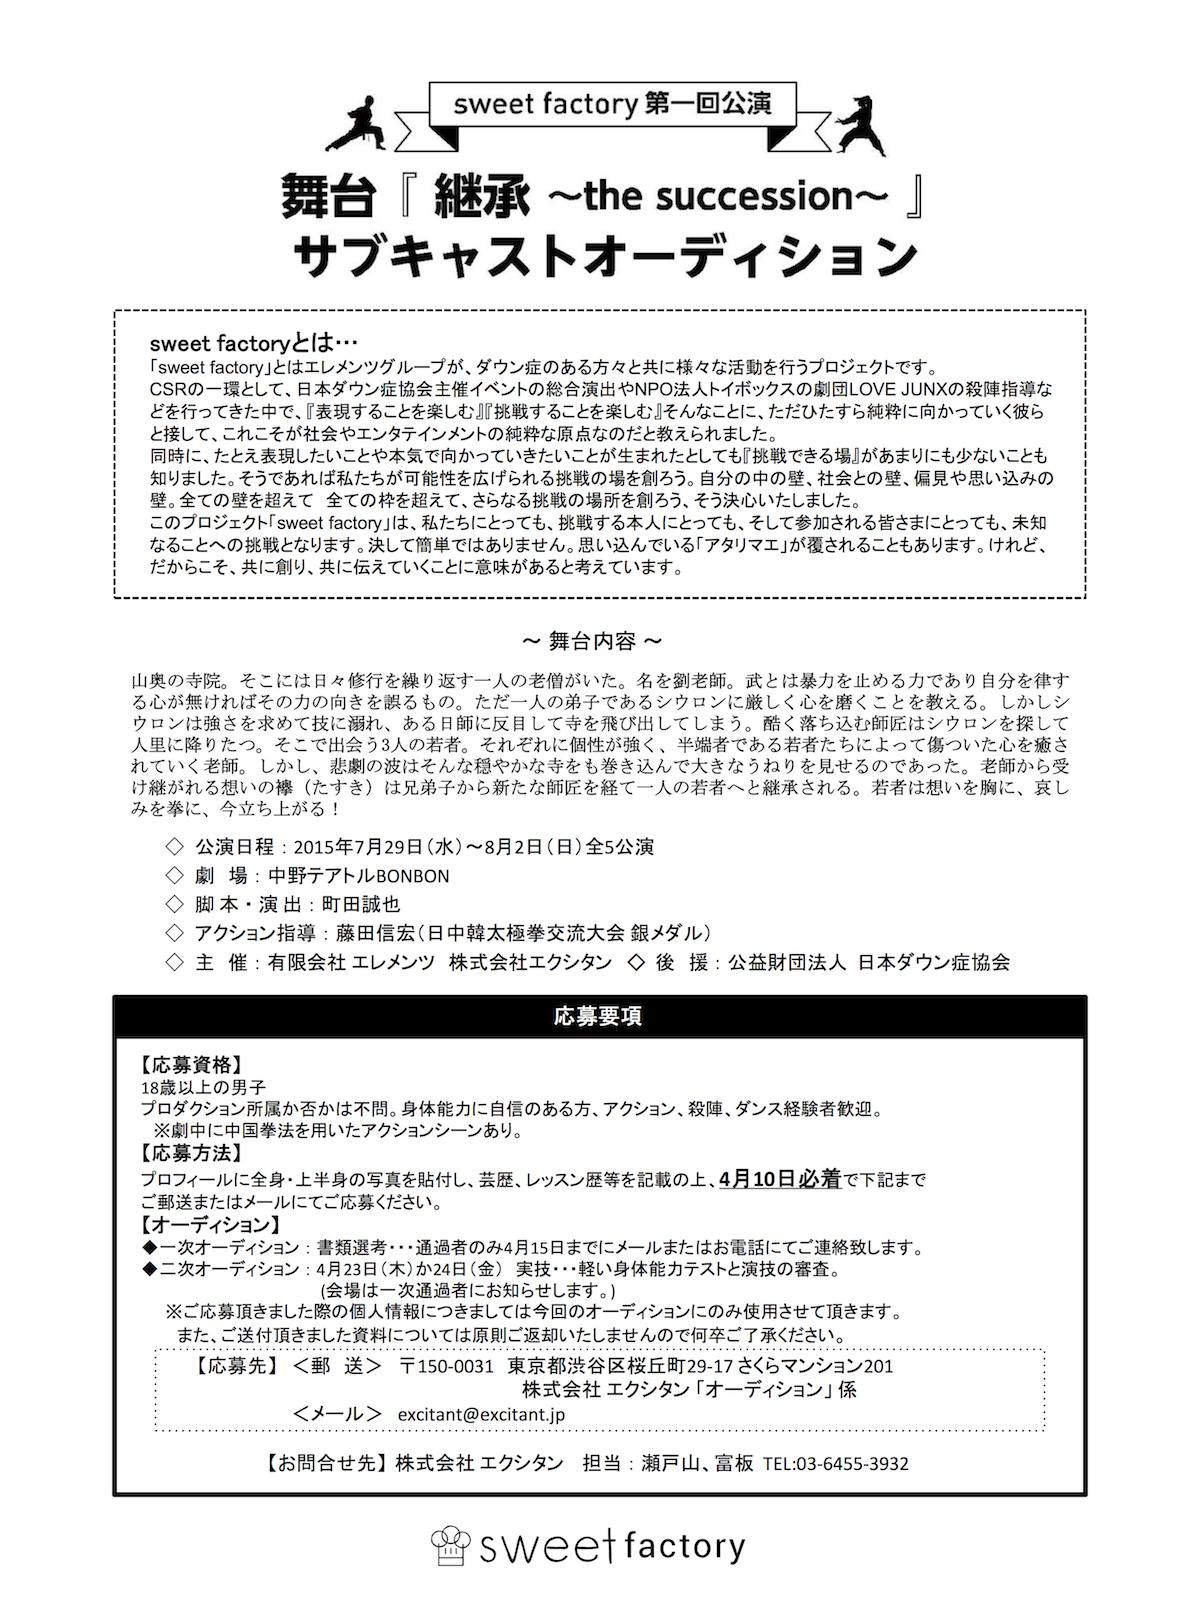 sweetfactory応募